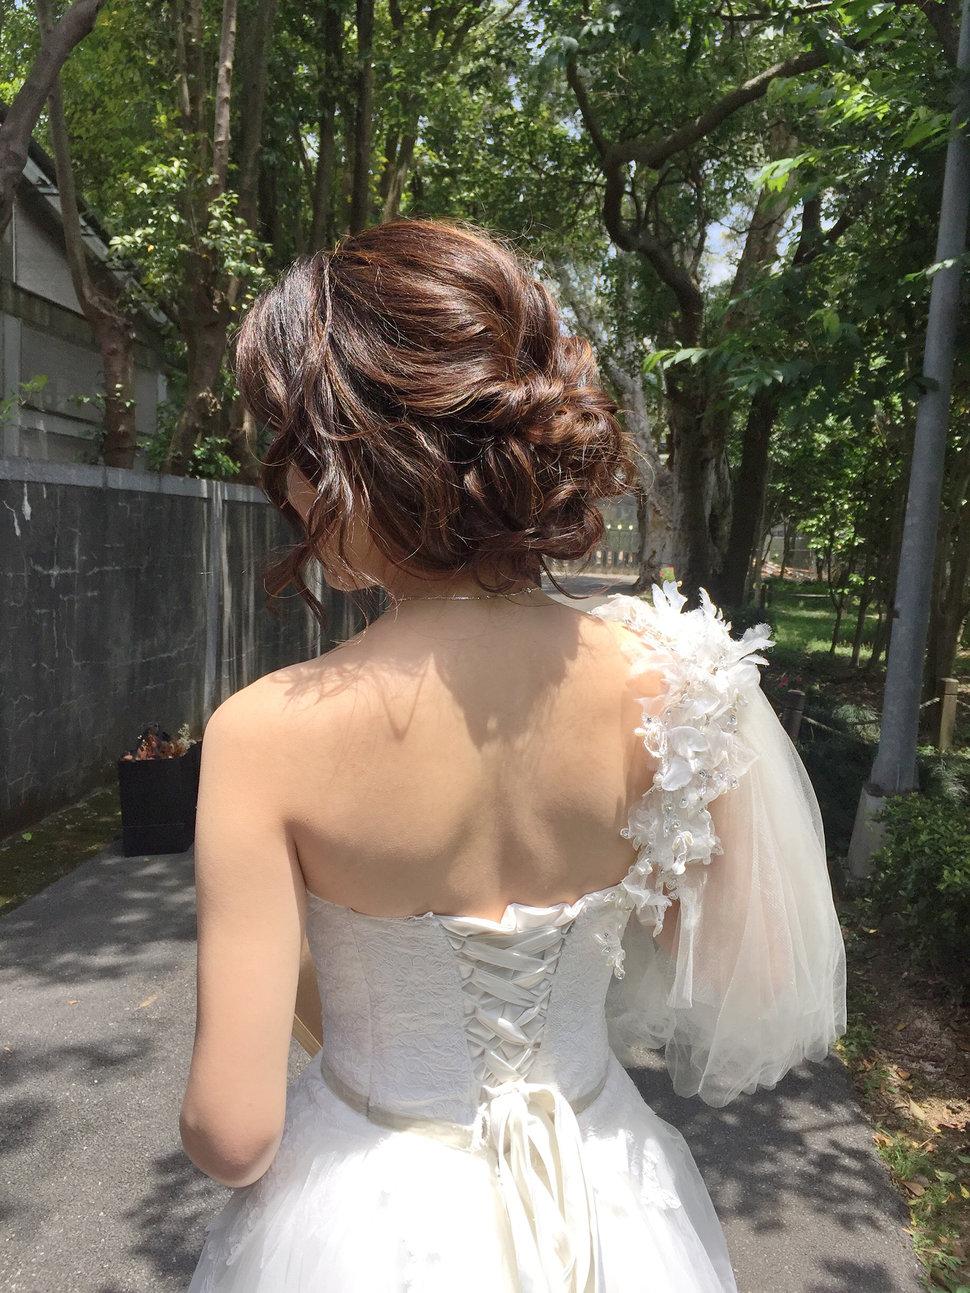 IMG_1807 - Jojo chen Makeup新娘秘書《結婚吧》